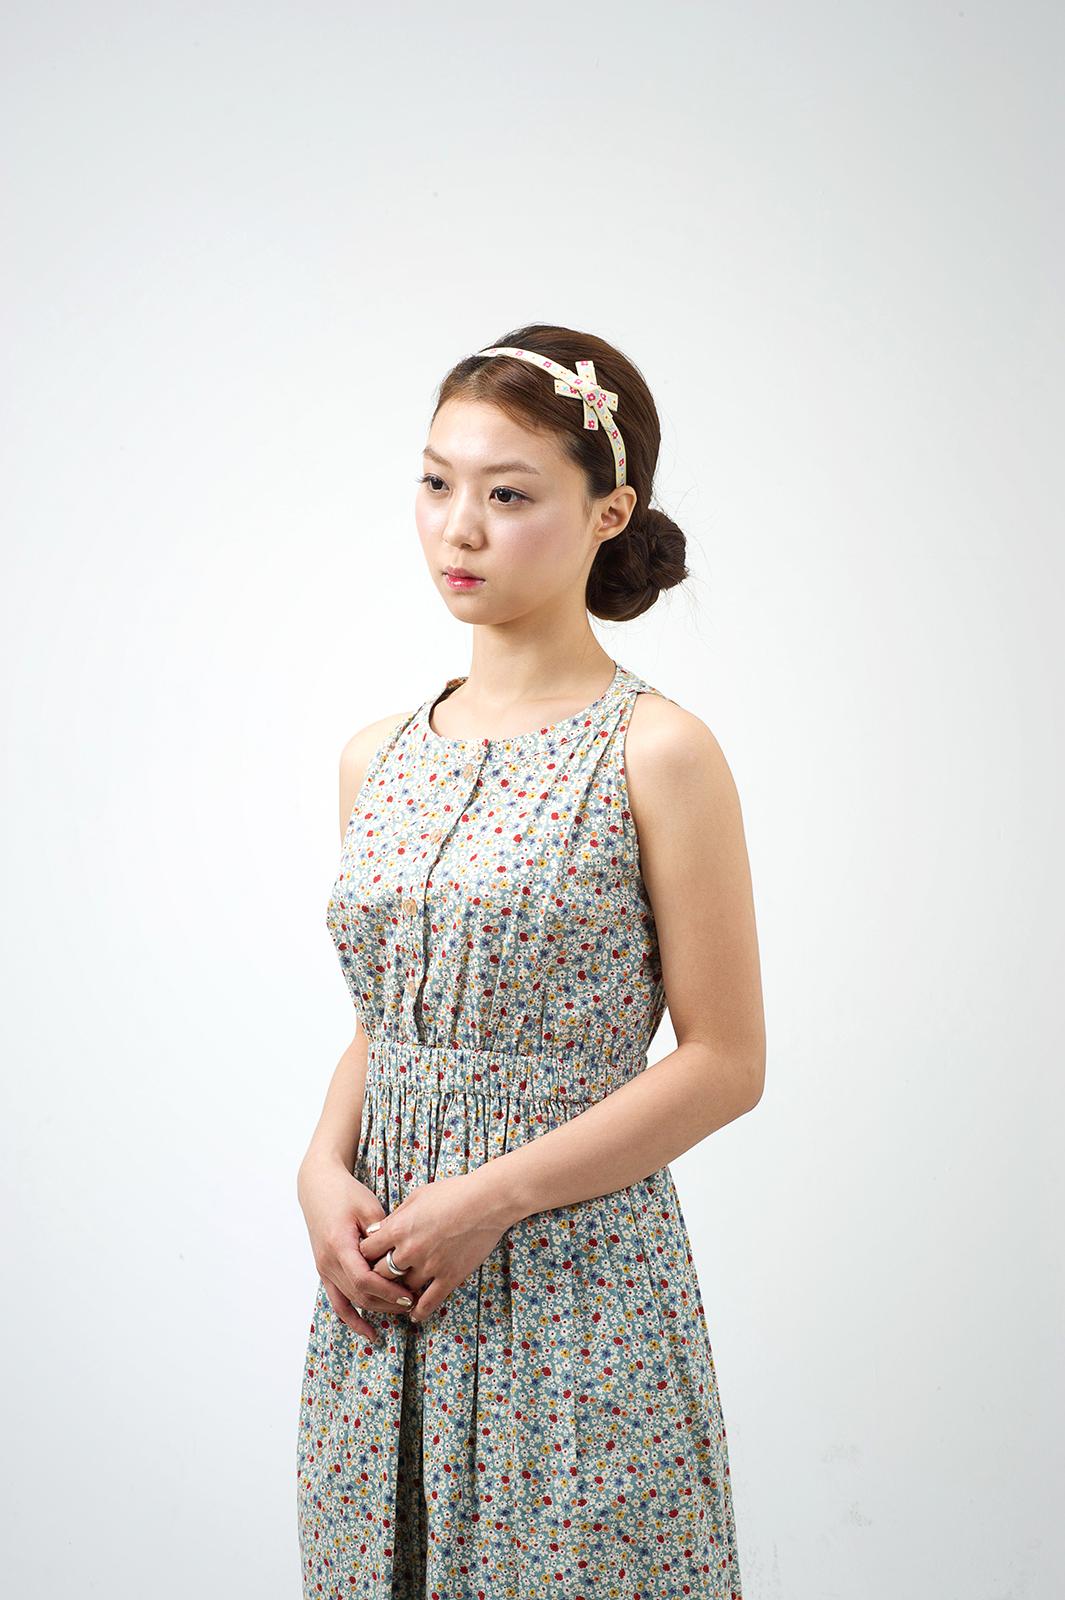 Model (2017)